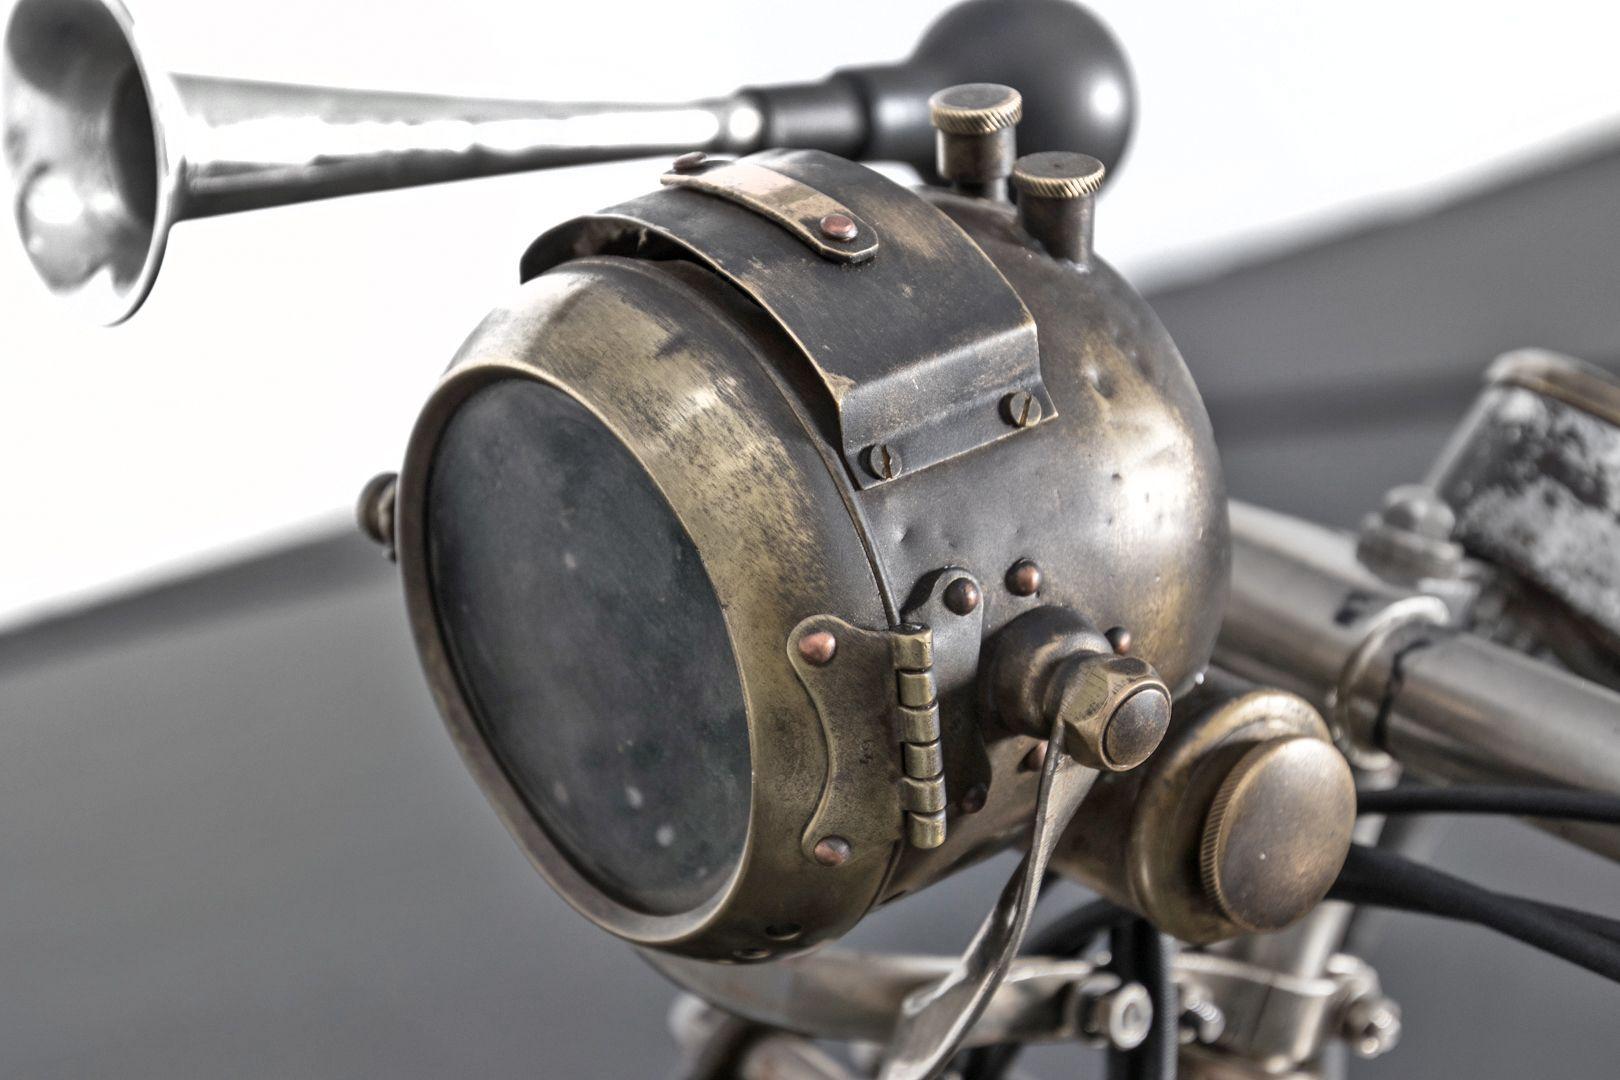 1924 Moto Guzzi 500 Normale 36473